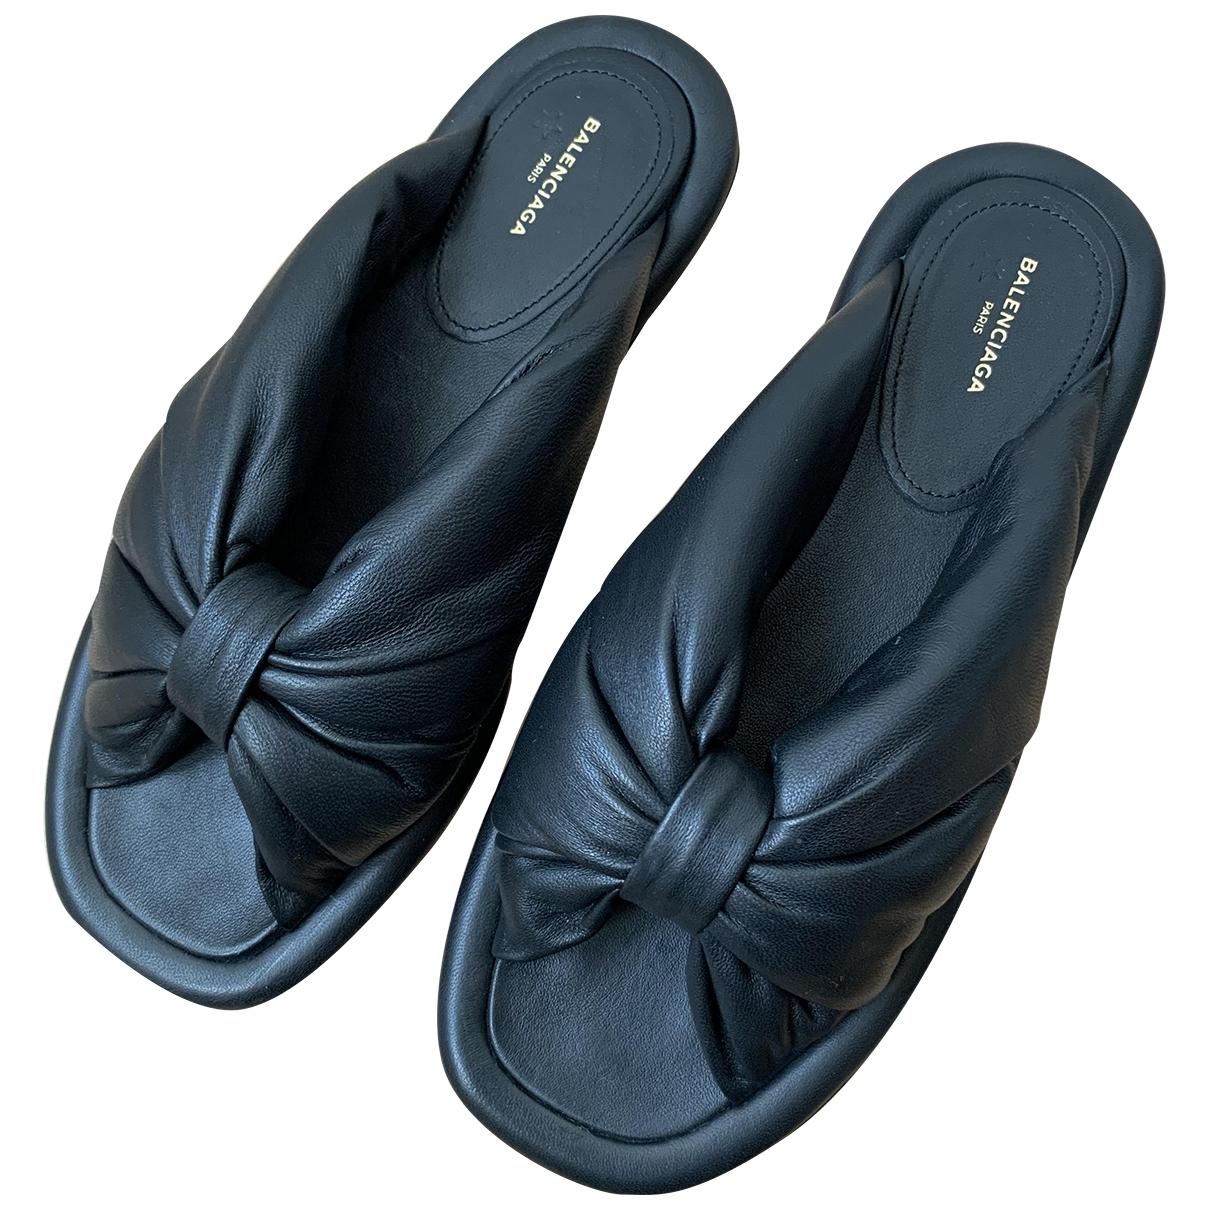 Balenciaga \N Black Leather Sandals for Women 36 EU